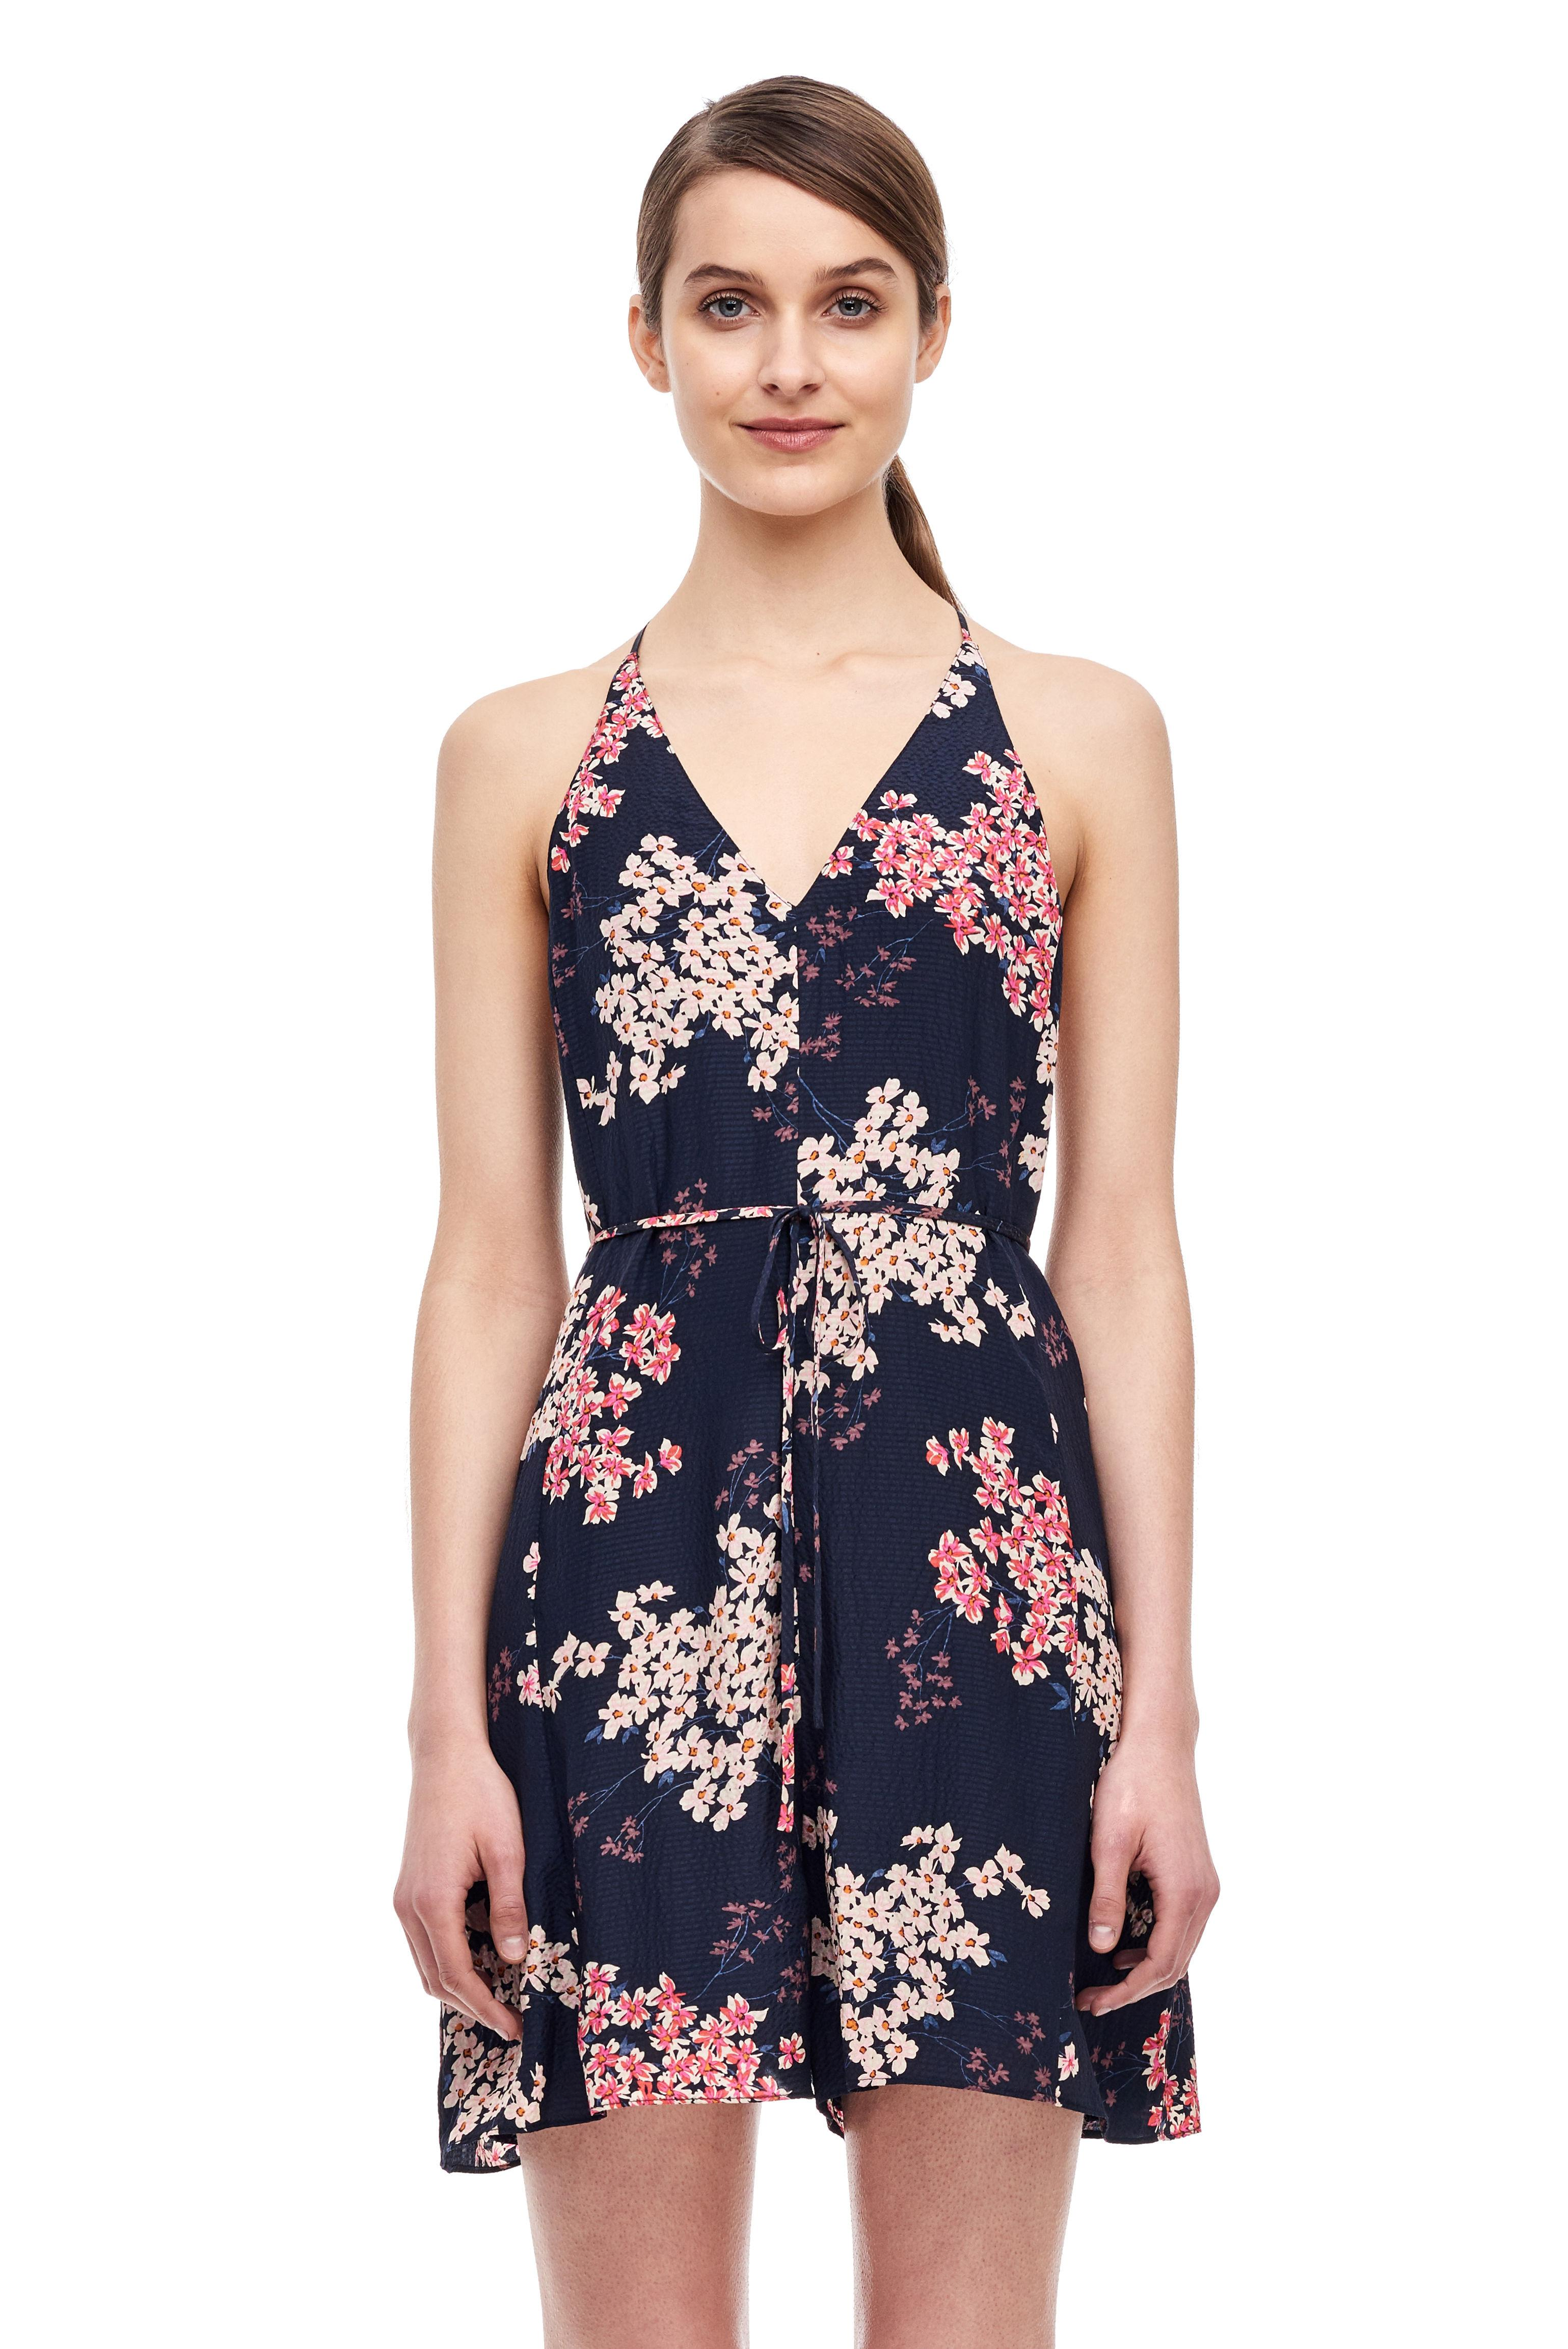 a4b23b08a3e Lyst - Rebecca Taylor Phlox Floral Jumpsuit in Blue